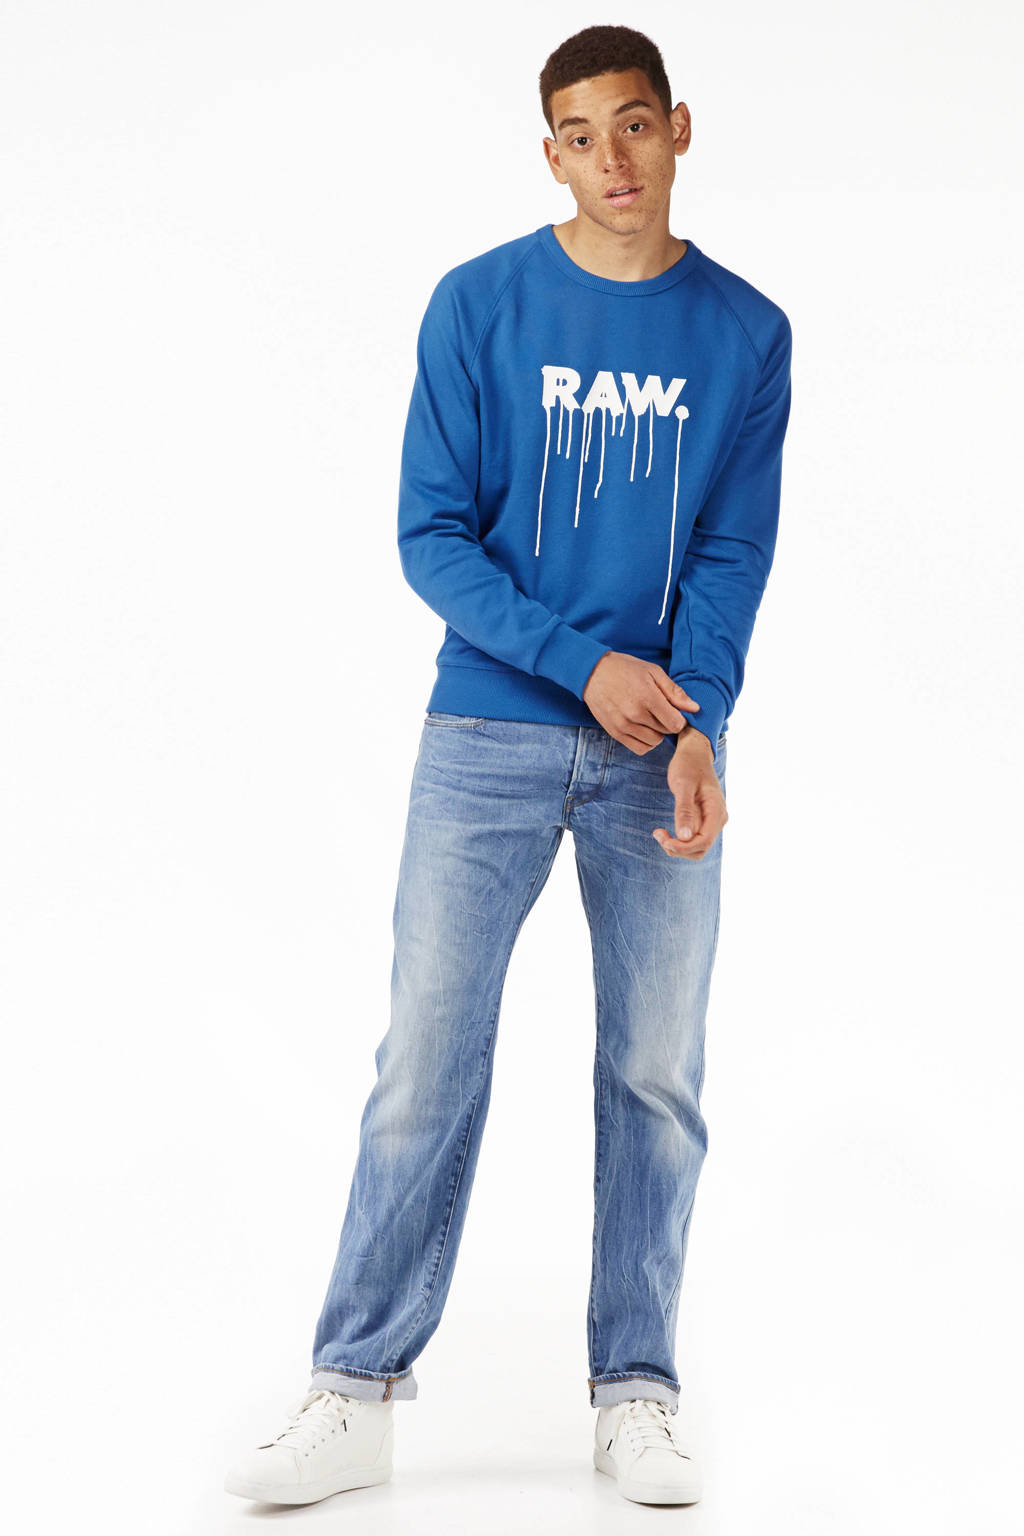 G-Star RAW straight fit jeans 3301, Medium aged denim